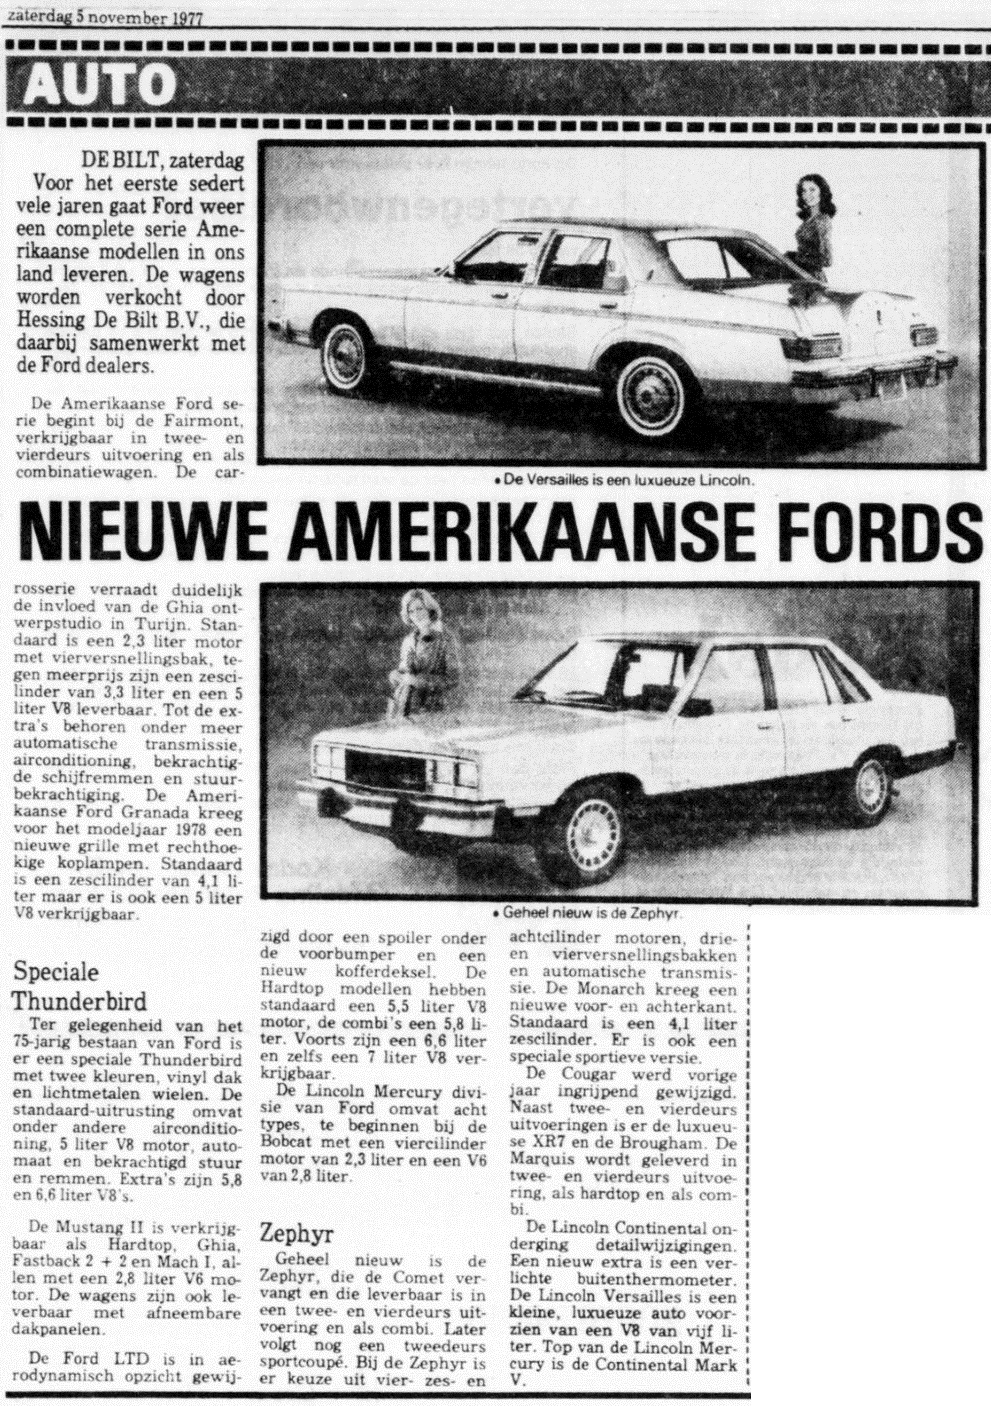 5 nov 1977